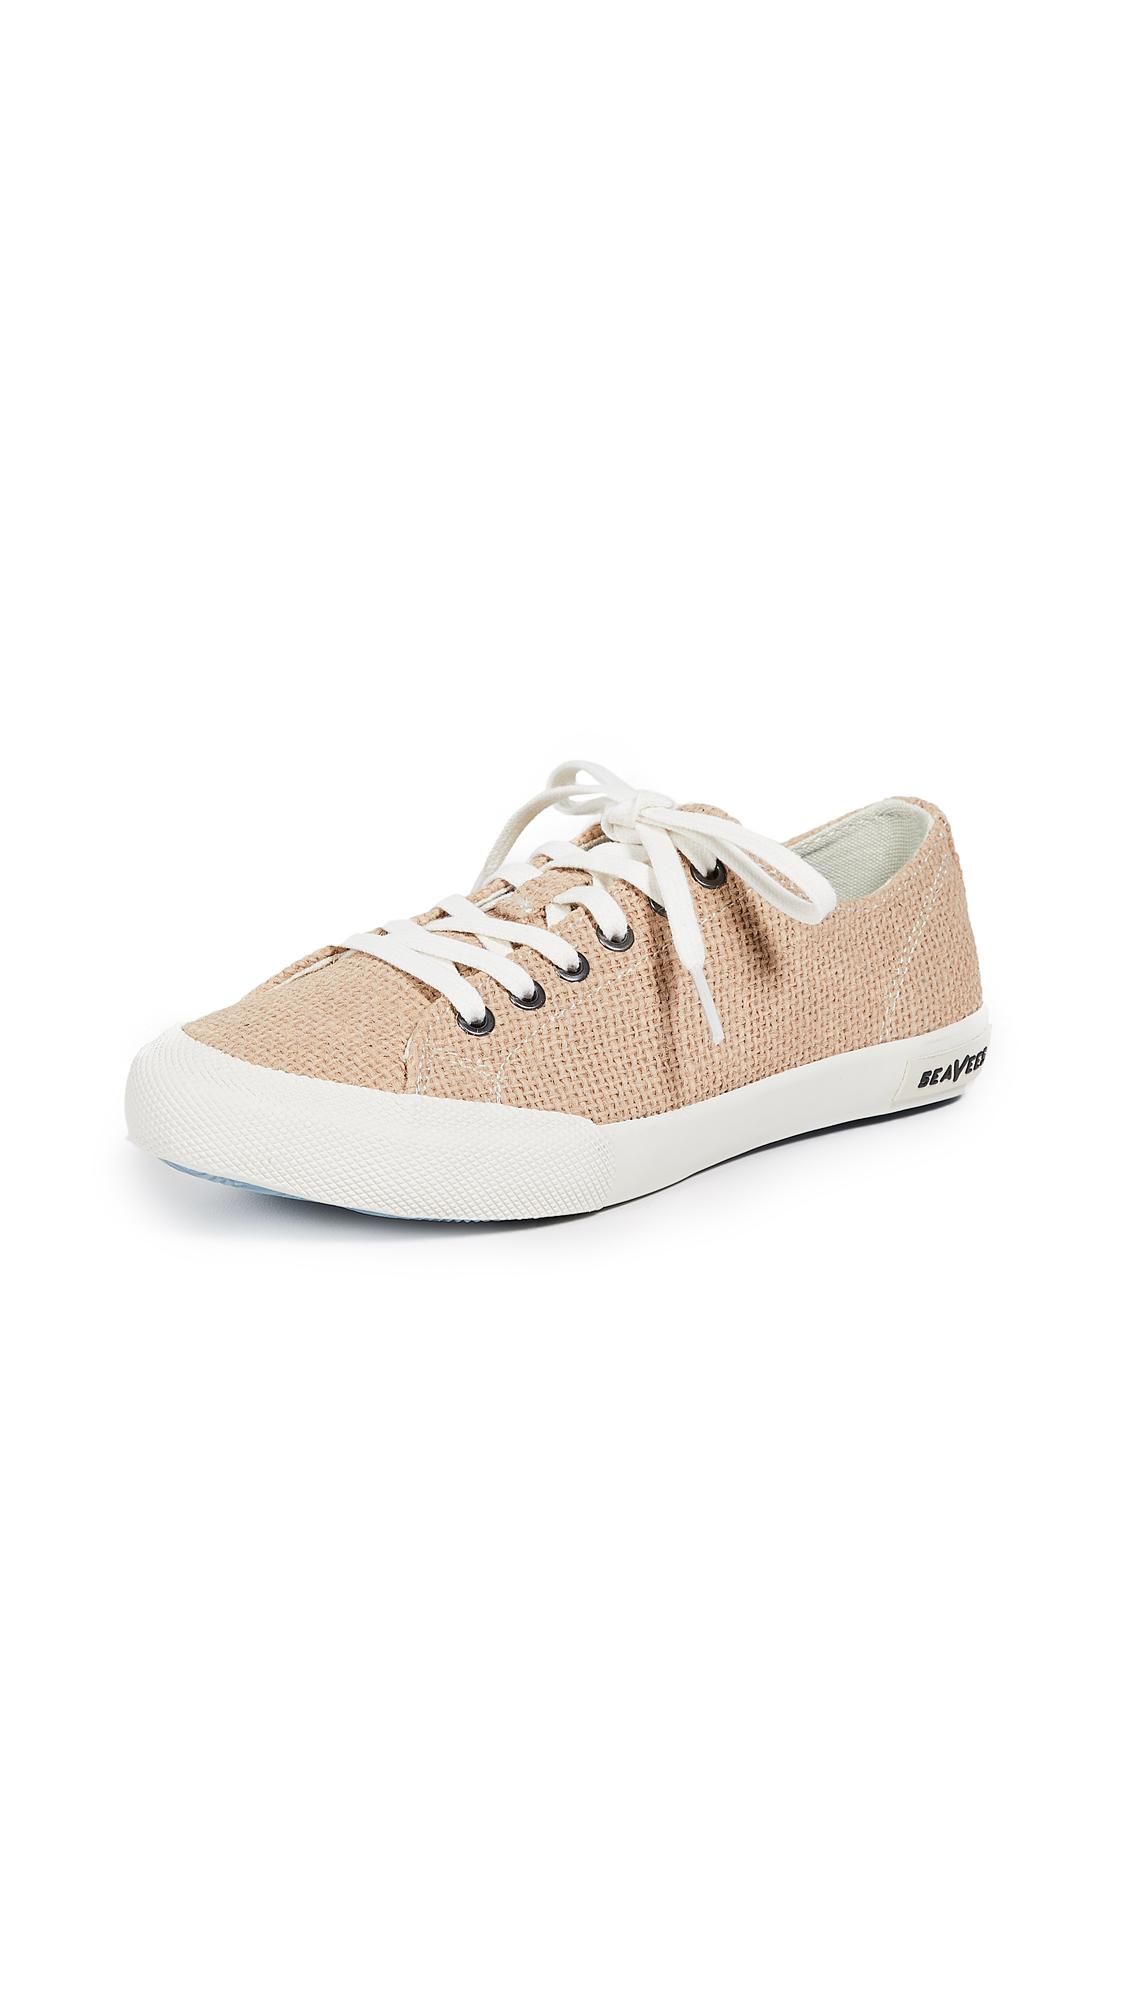 SeaVees Monterey Raffia Sneakers - Natural